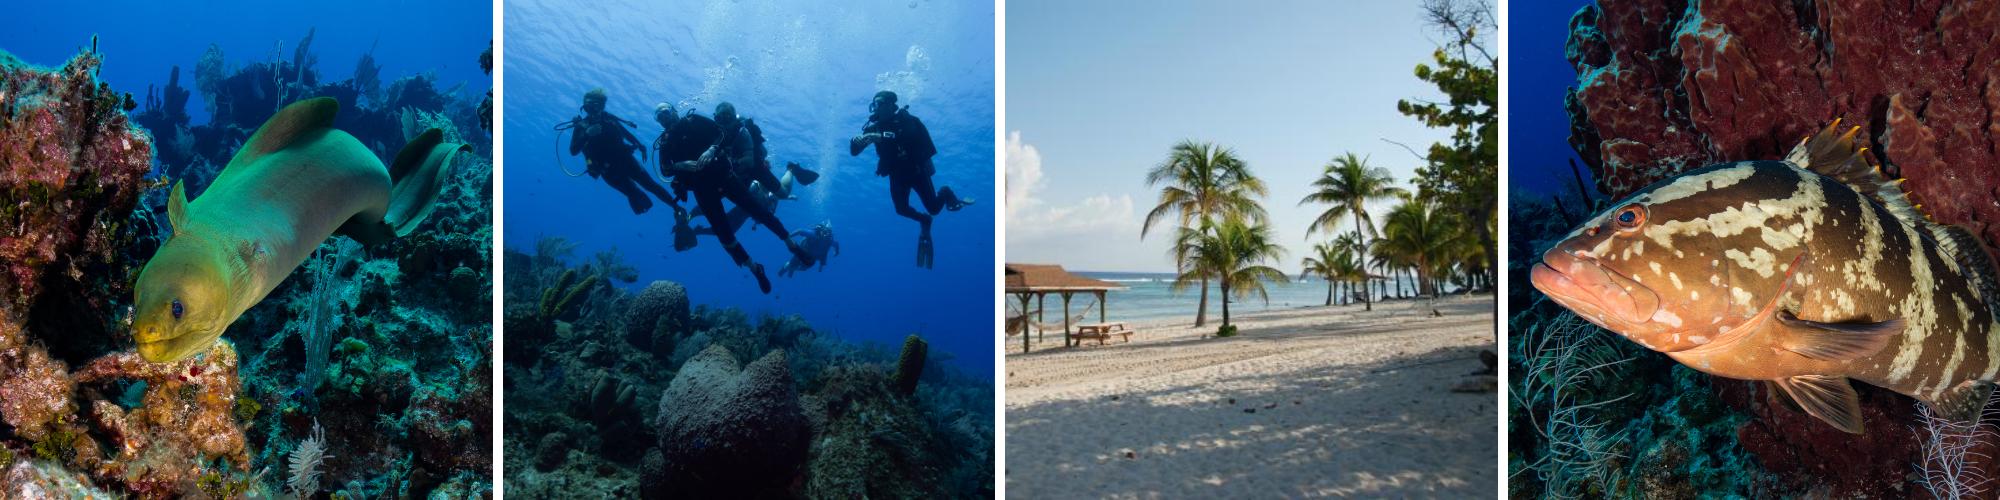 Cayman Brac Underwater